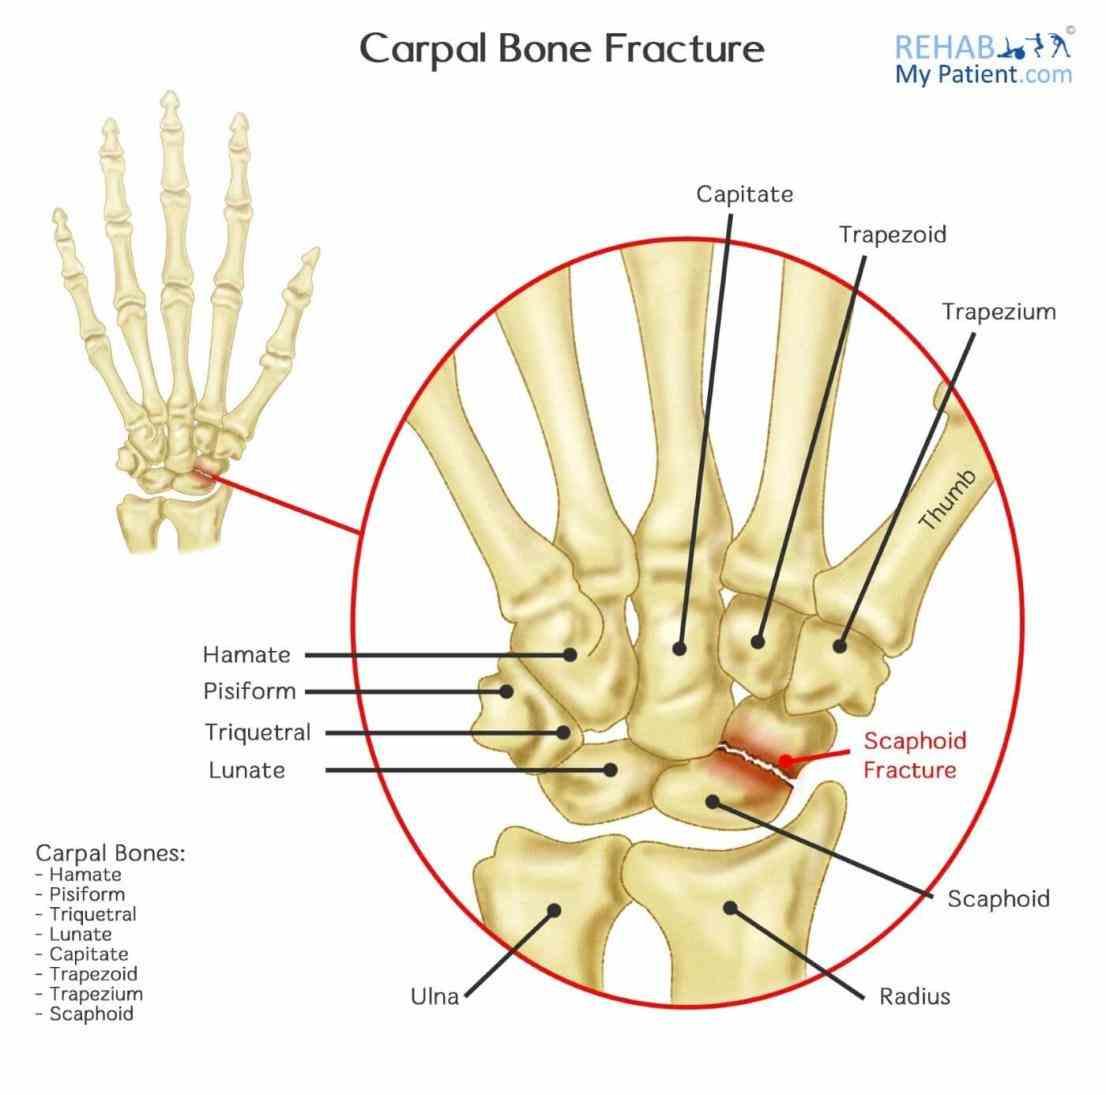 Carpal Bones Pictures Wallpapers